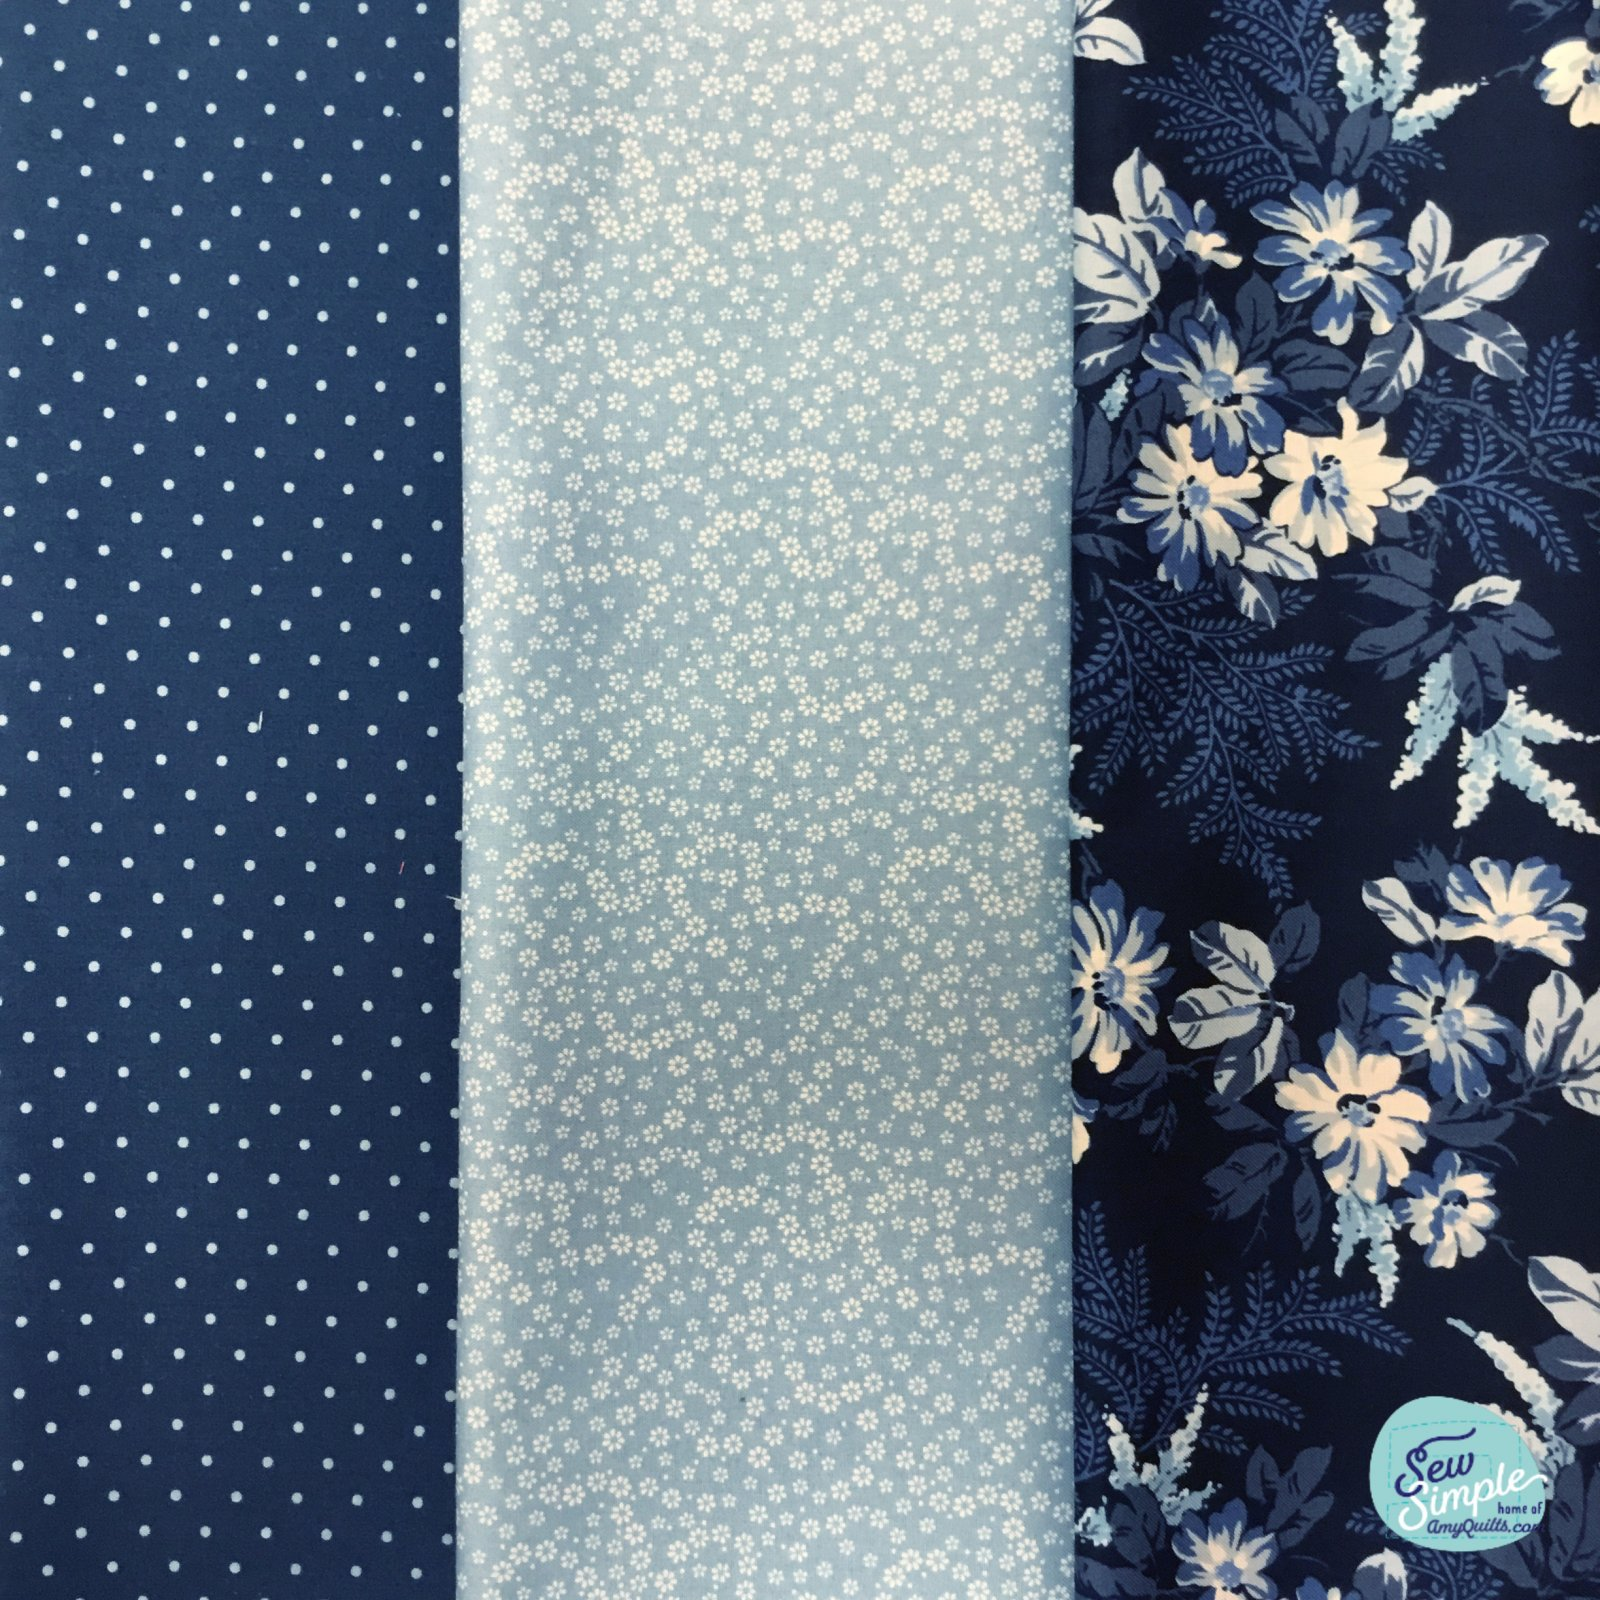 3 Yard Quilt Bundle - Azul Florals 2